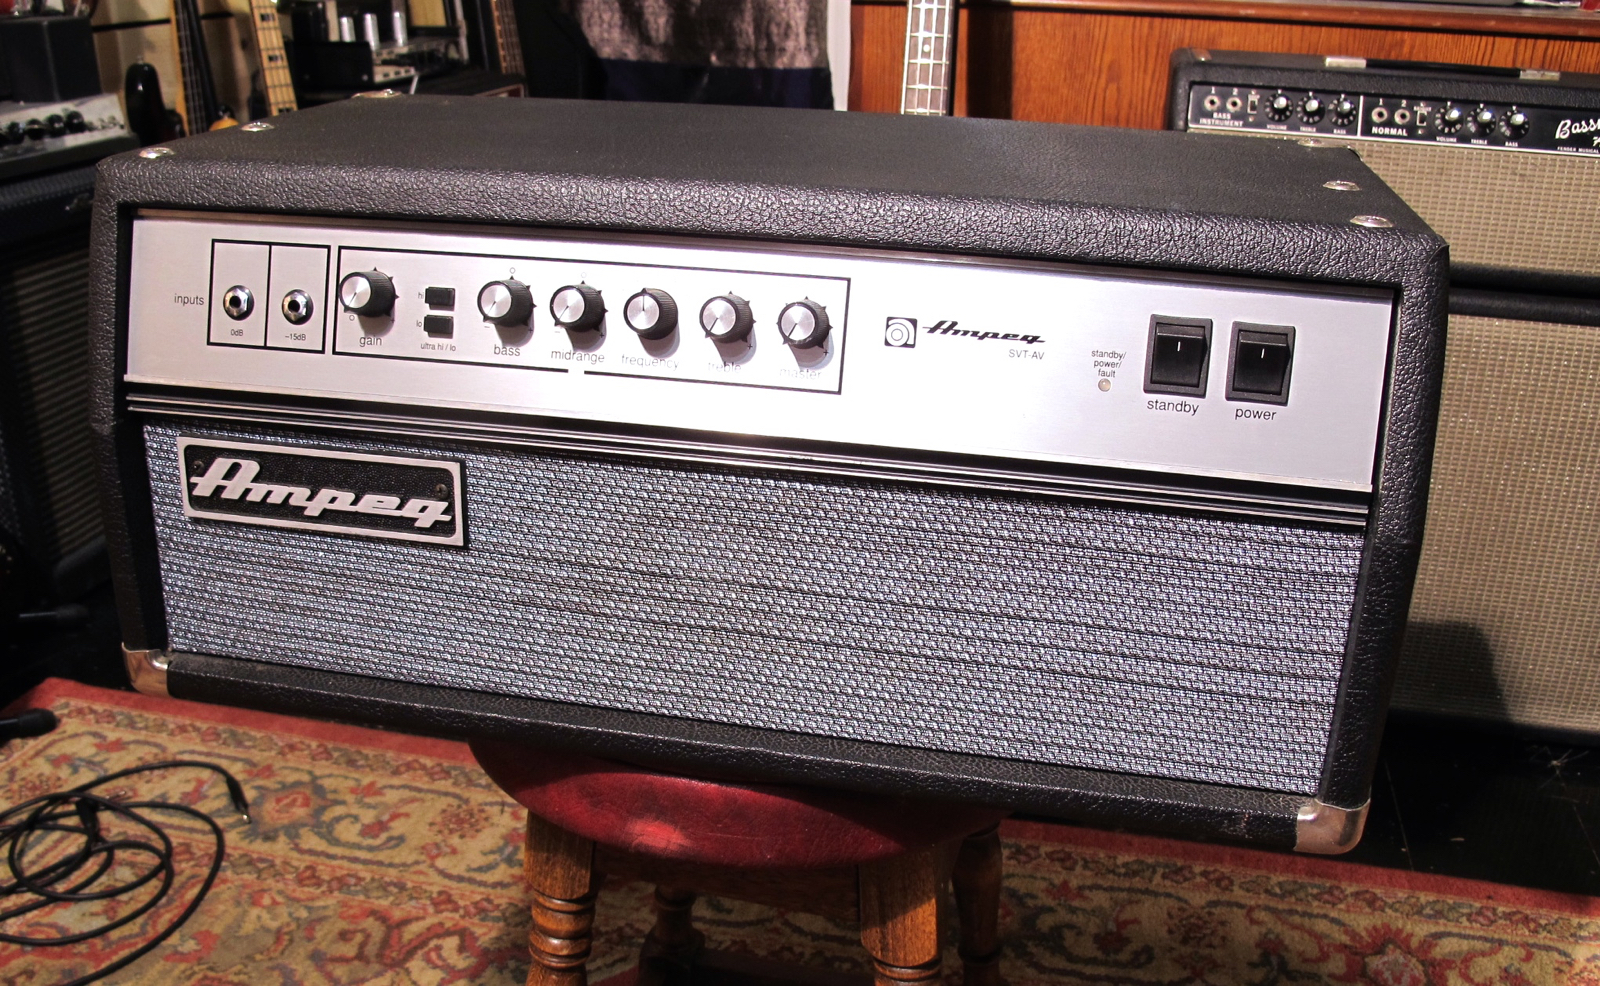 Ampeg SVT AV 2002 Black Tolex Amp For Sale Andy Baxter